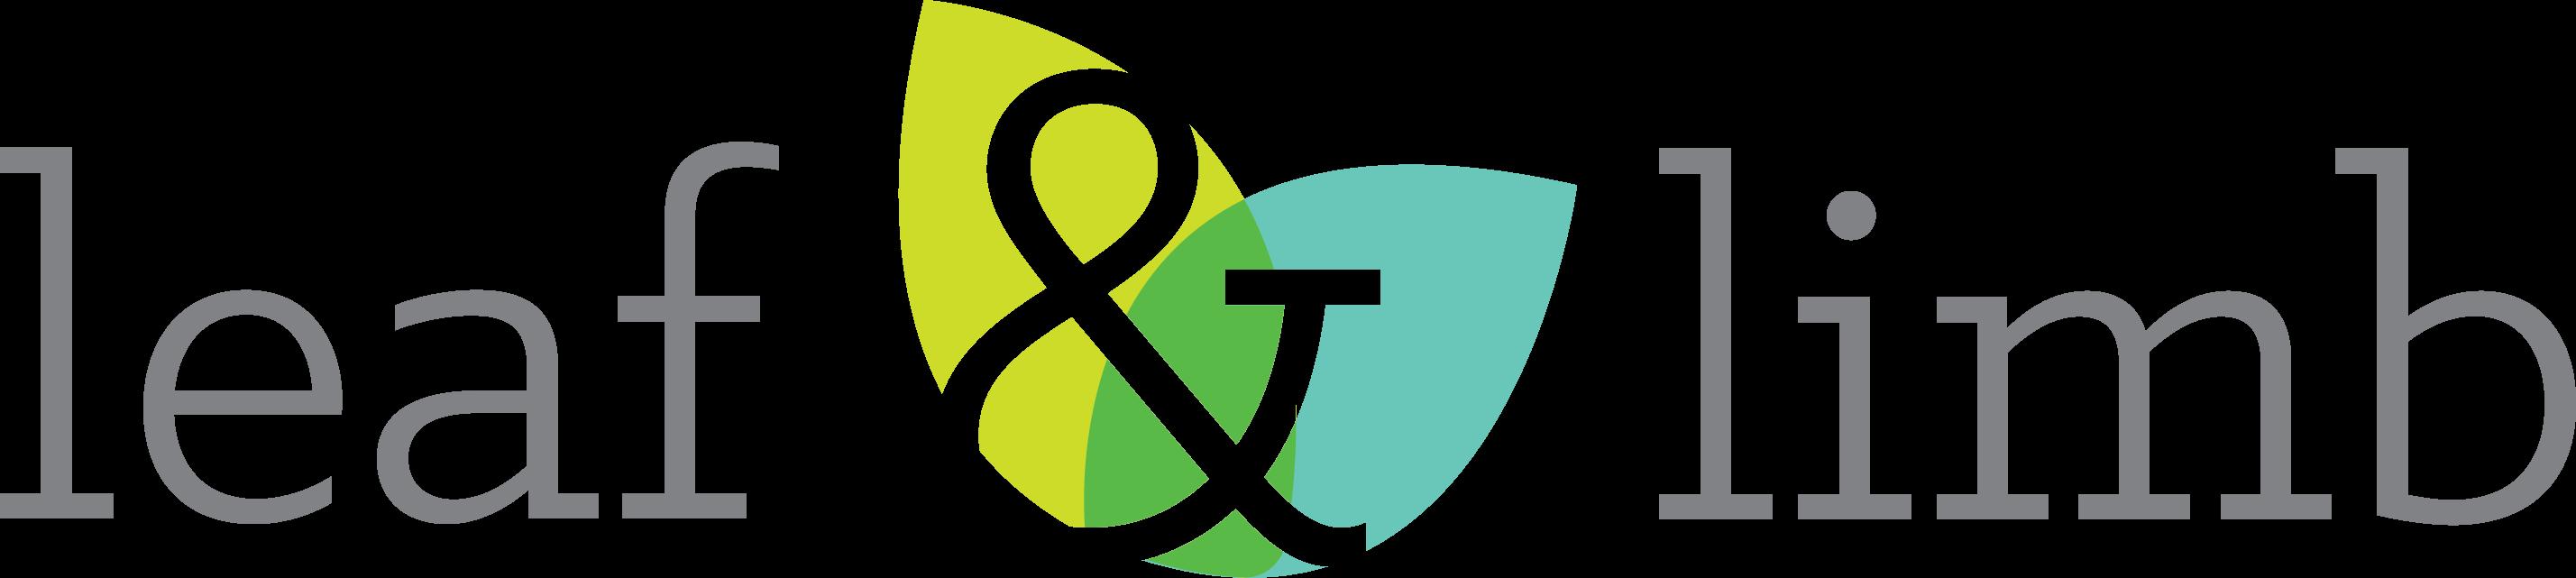 Leaf & Limb logo